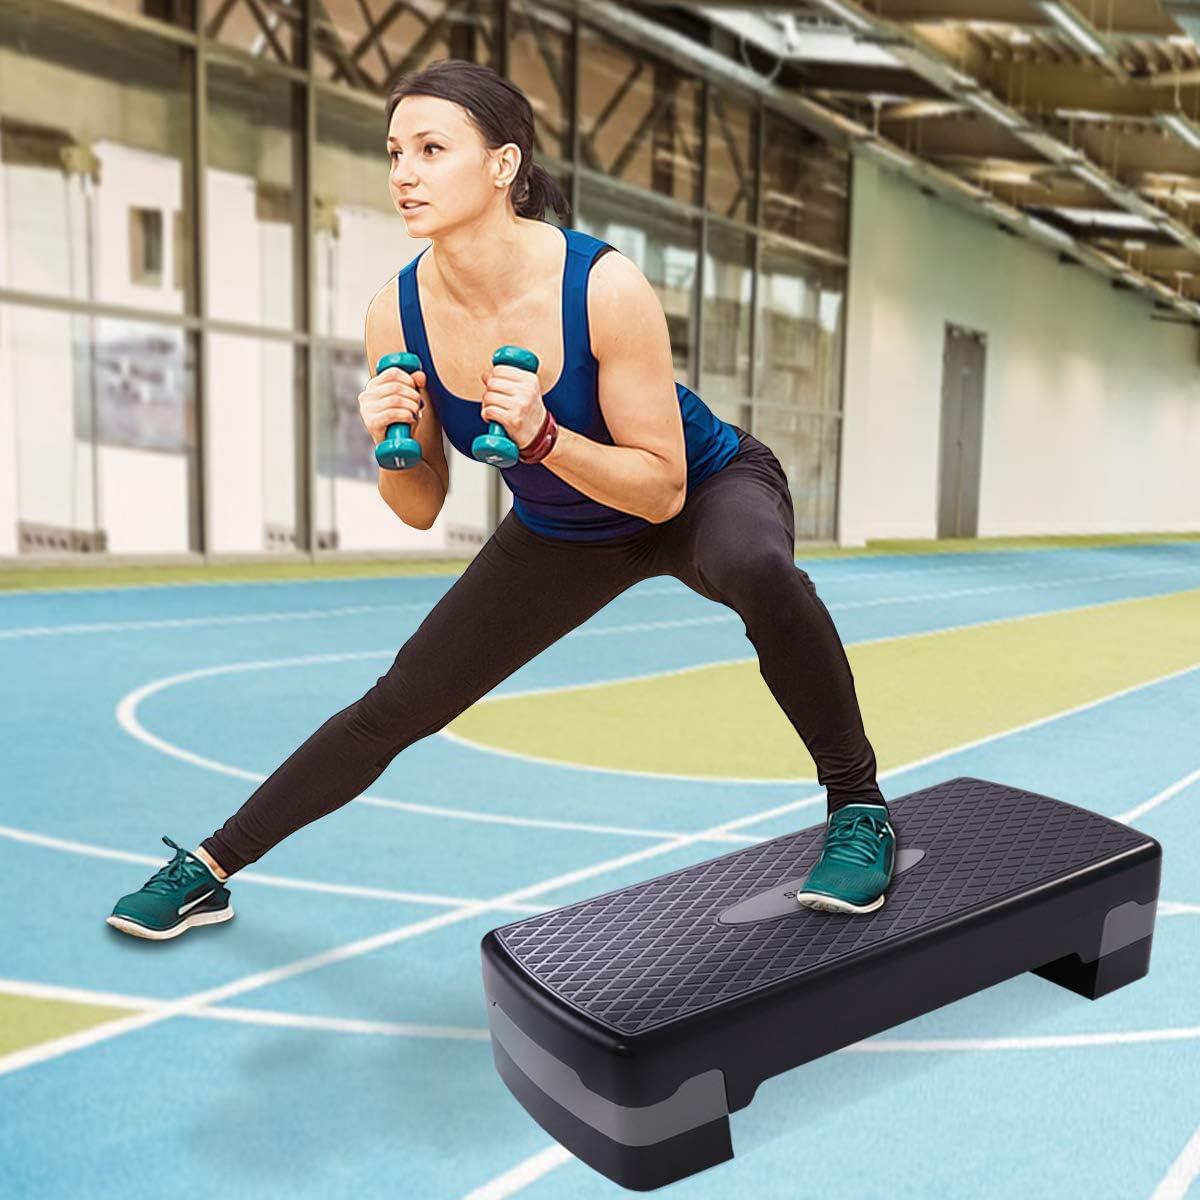 GOPLUS 43 Step Platform Adjustable Fitness Aerobic Stepper 4 – 6 – 8 Non-Stick Surface W Risers